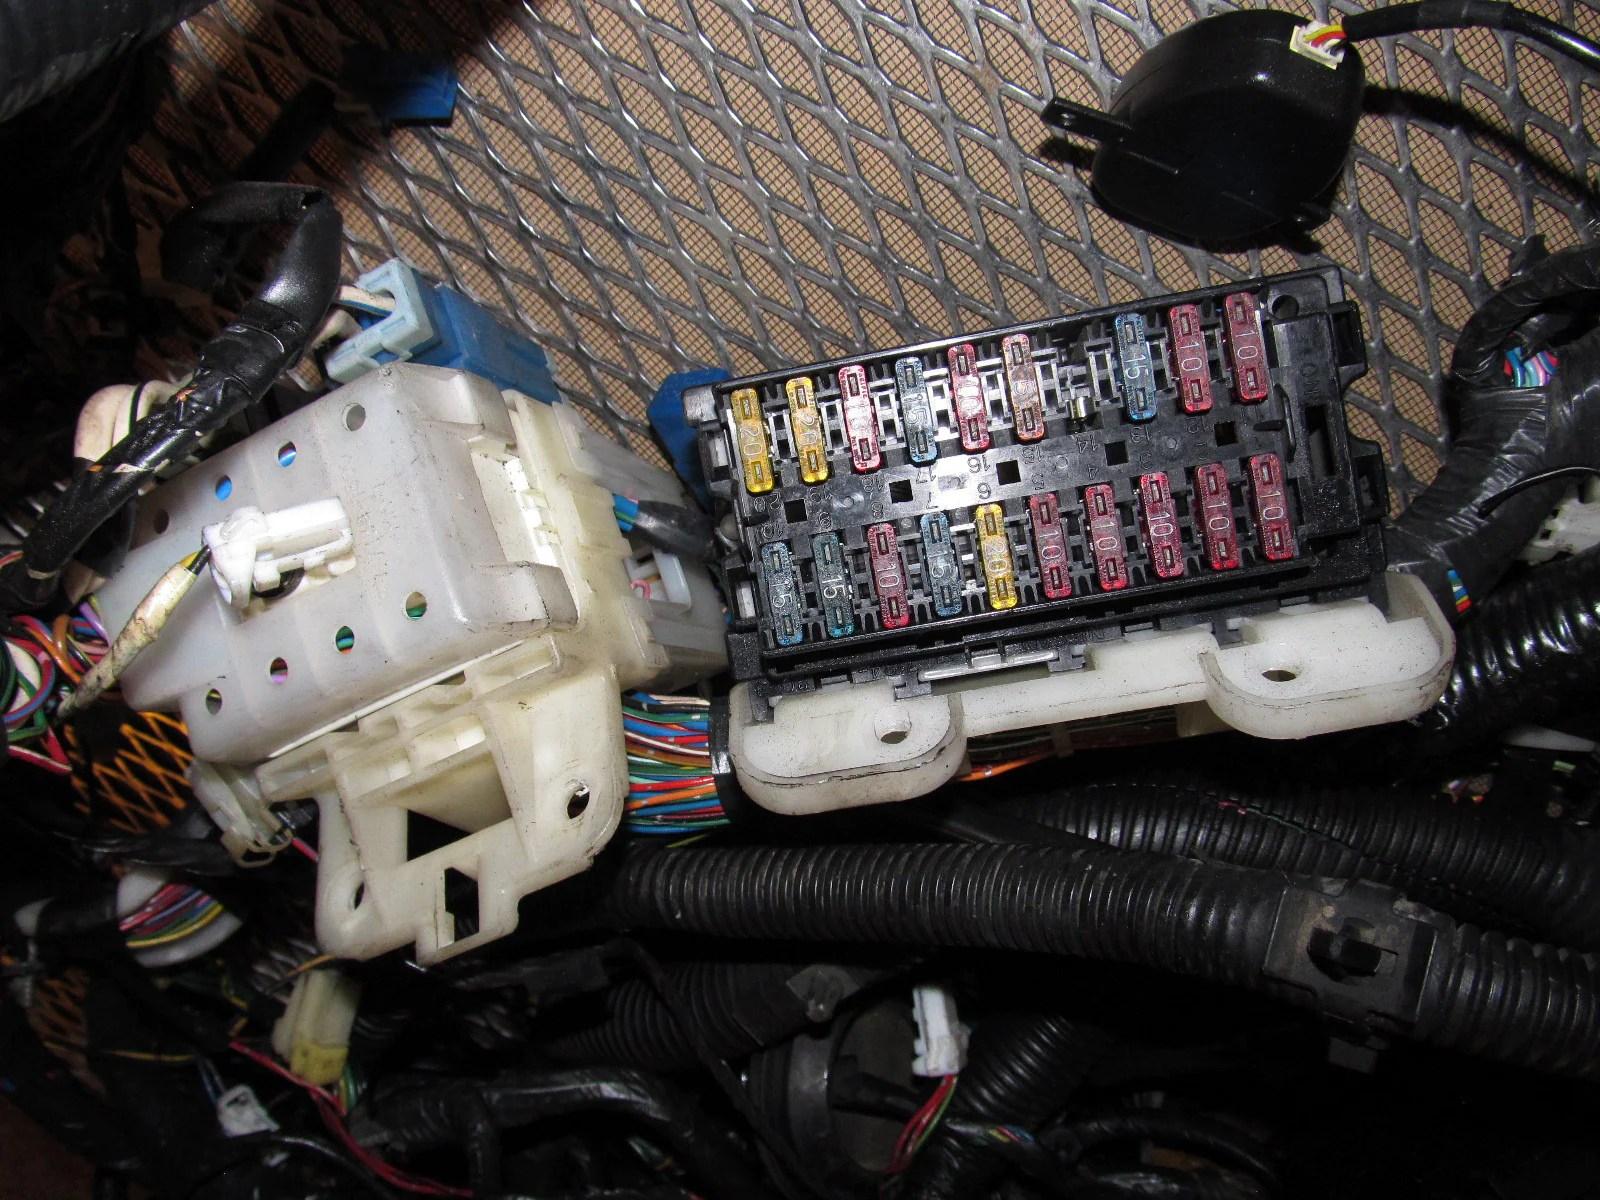 fuse box s13 hatch simple wiring schema 1995 240 s13 s13 240 fuse box [ 1600 x 1200 Pixel ]